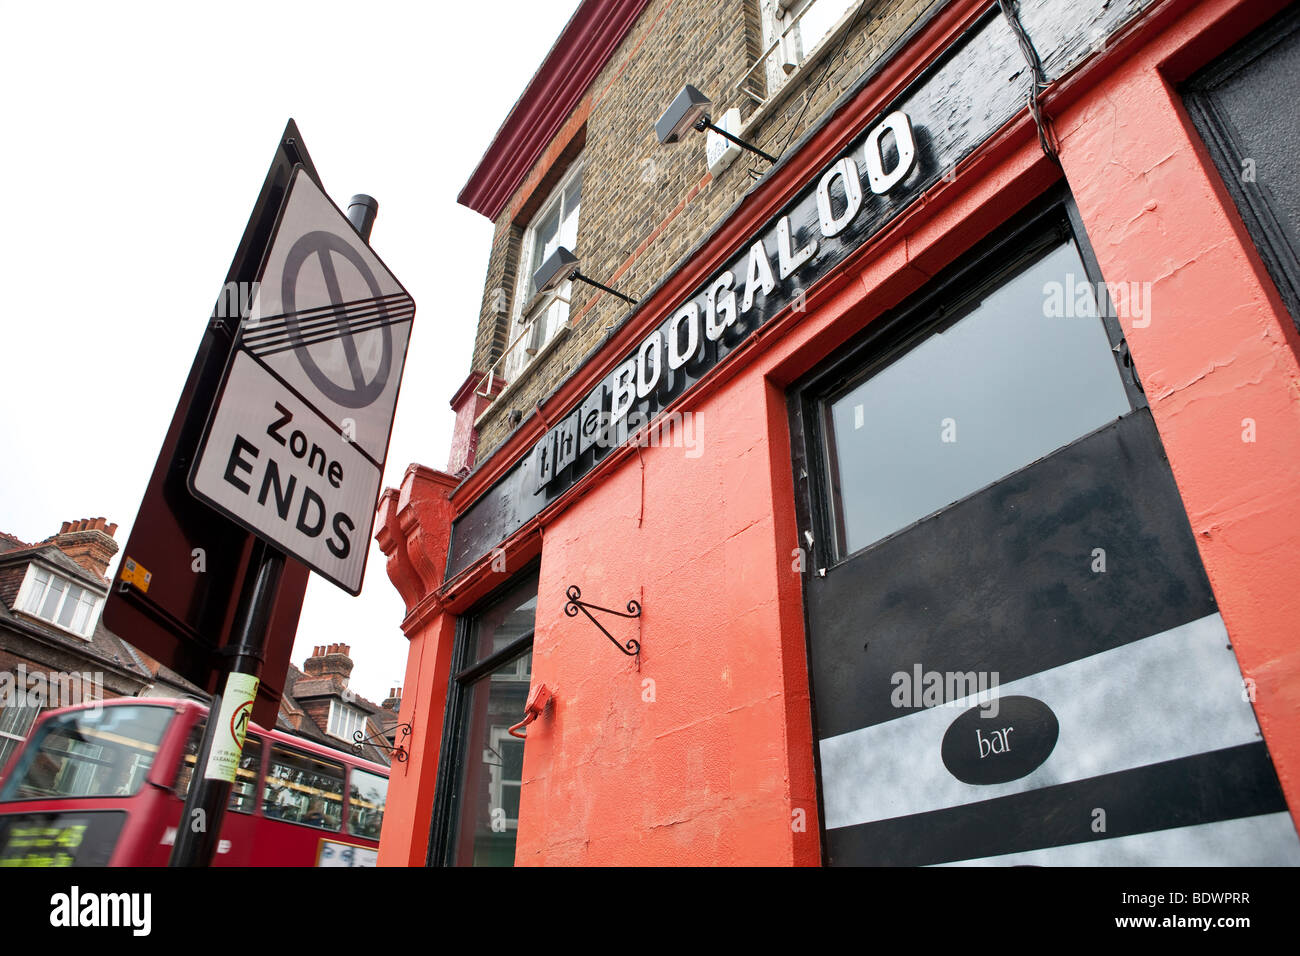 The Boogaloo pub, North London - Stock Image